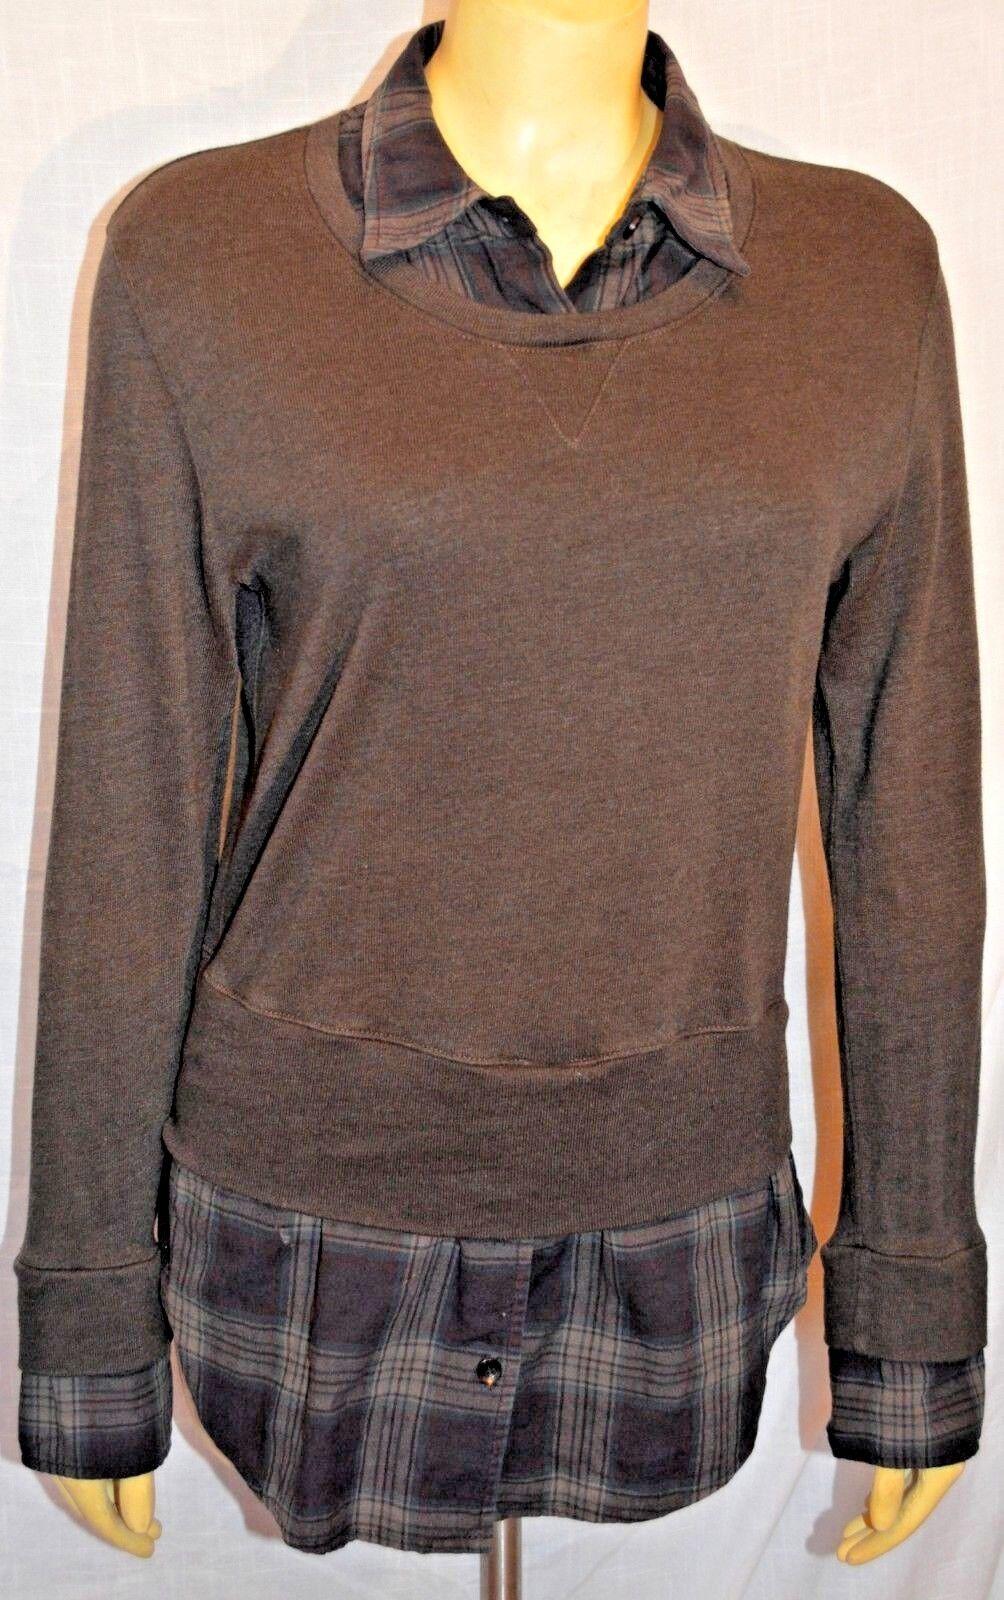 MONROW Fleece long Sleeve Sweatshirt plaid double layer Größe XS tunic EXCELLENT